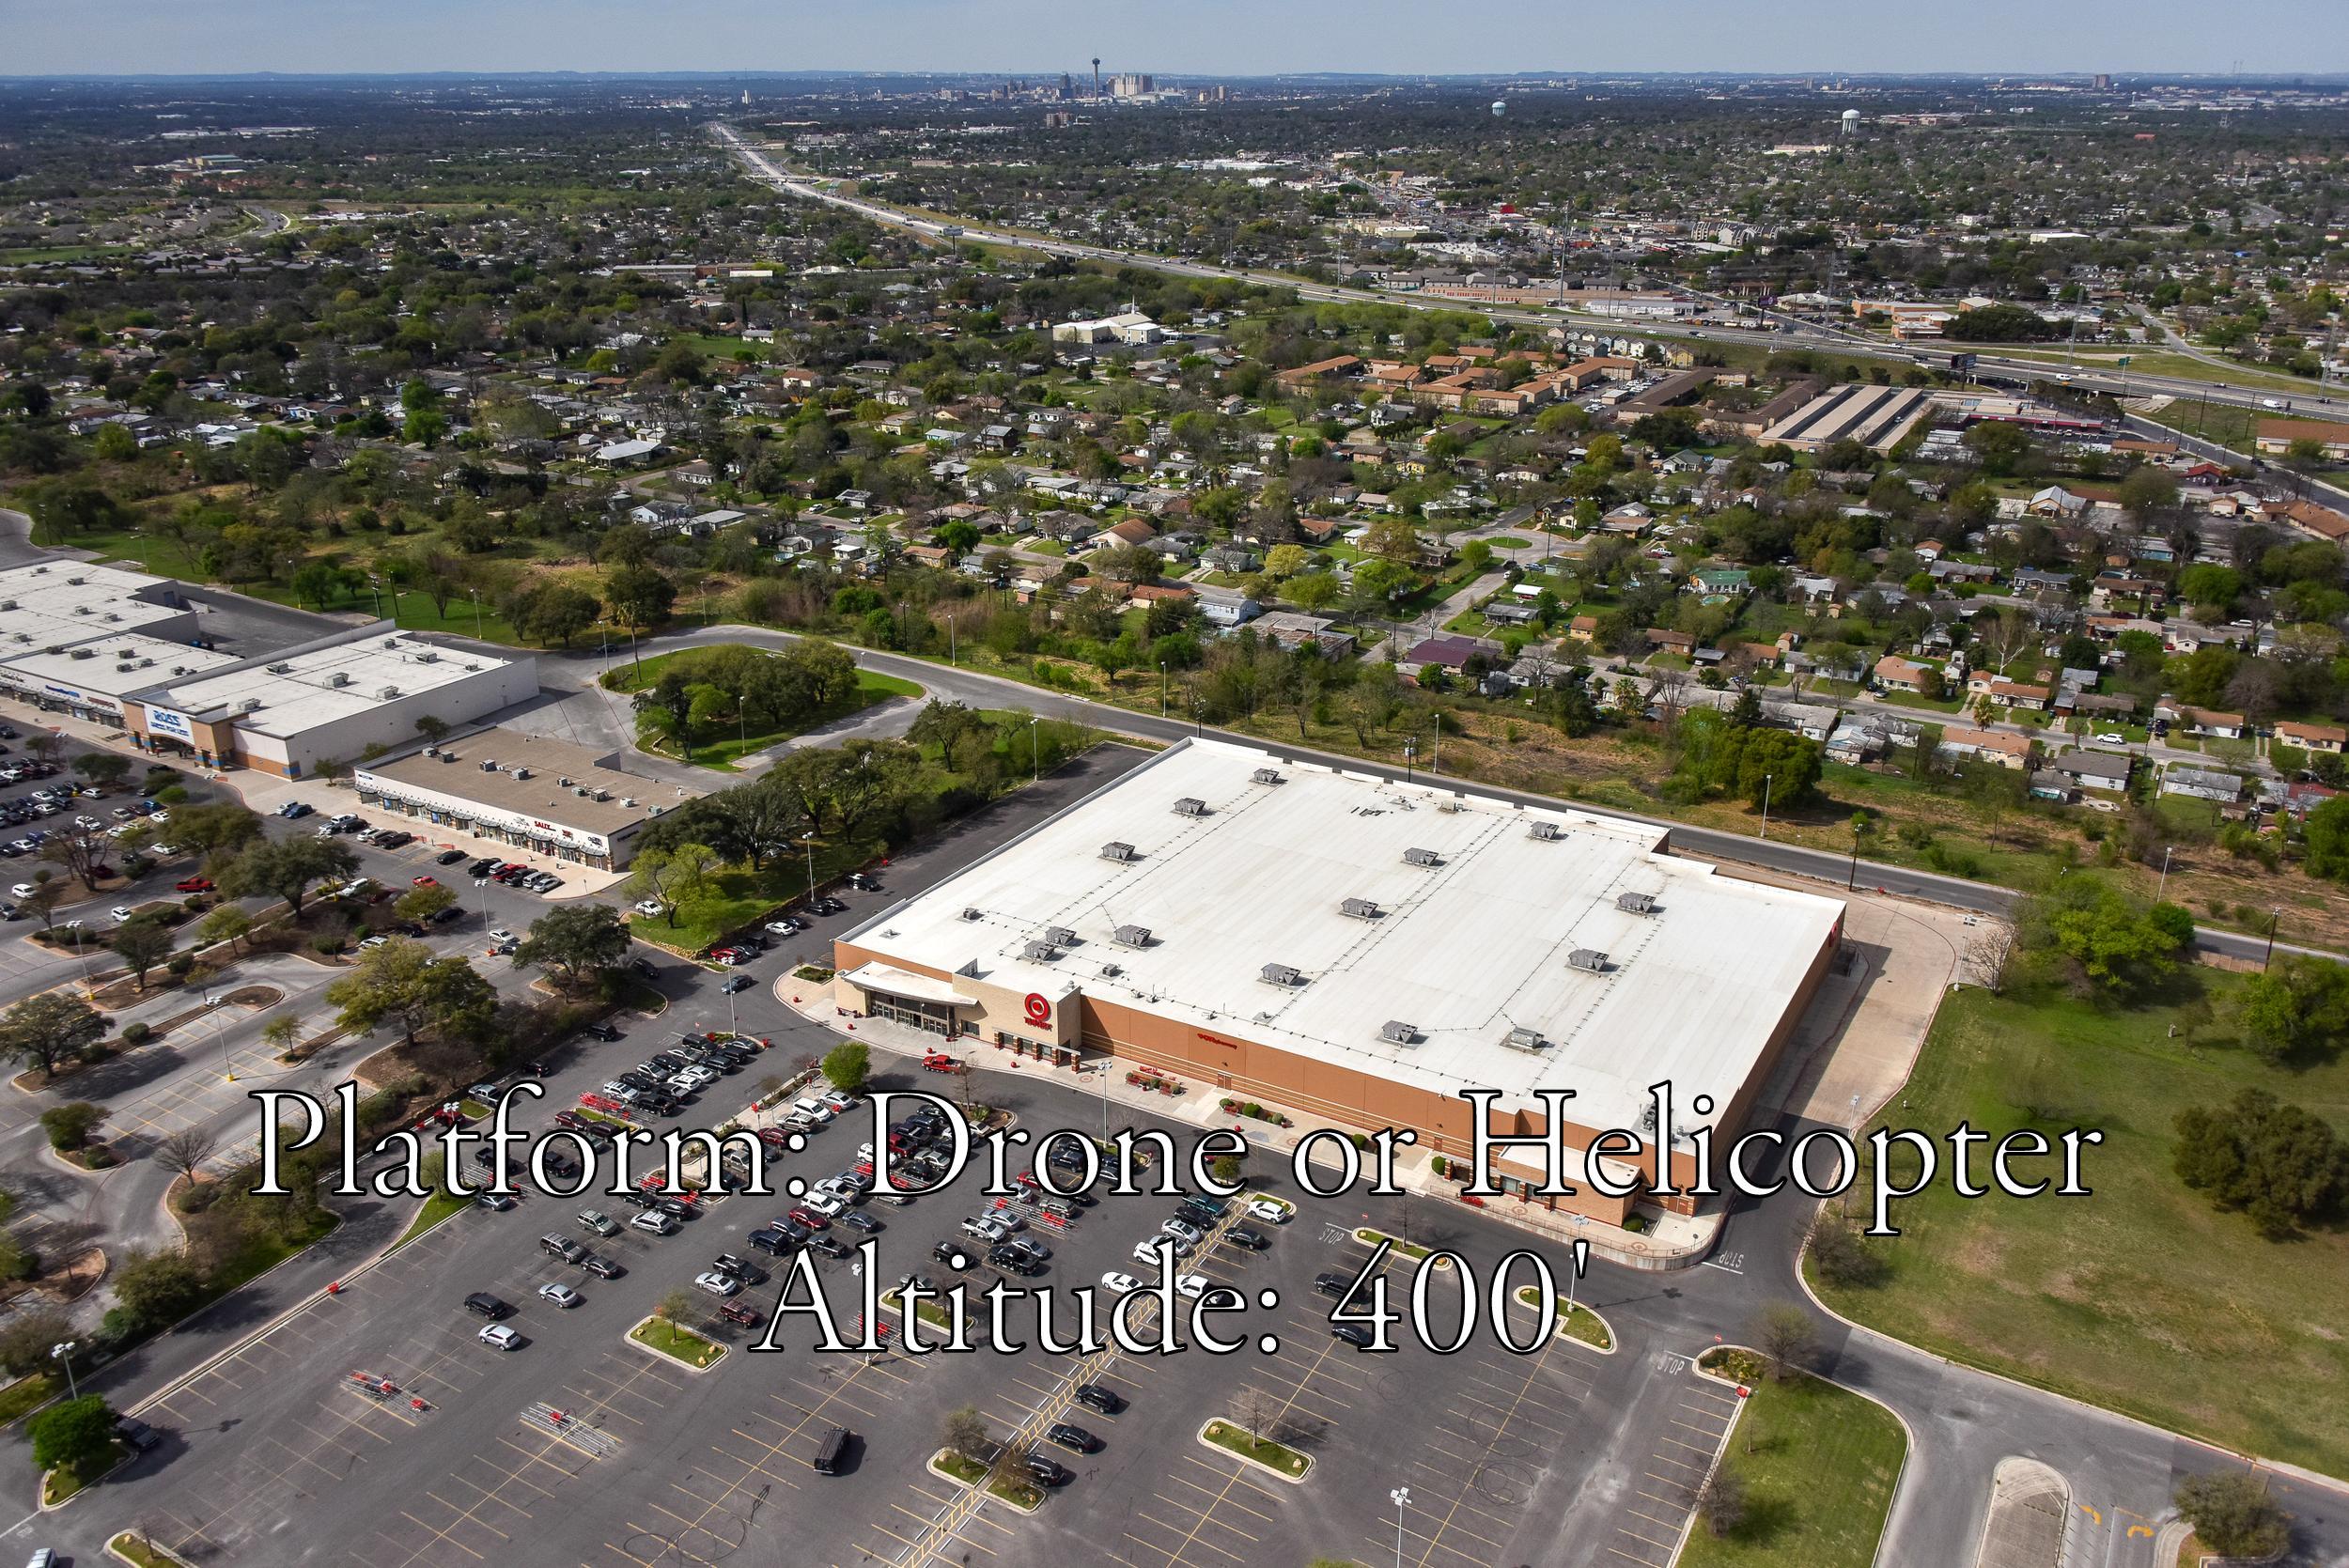 san-antonio-texas-aerial-photographer-drone-photo-image-tx-drone-400